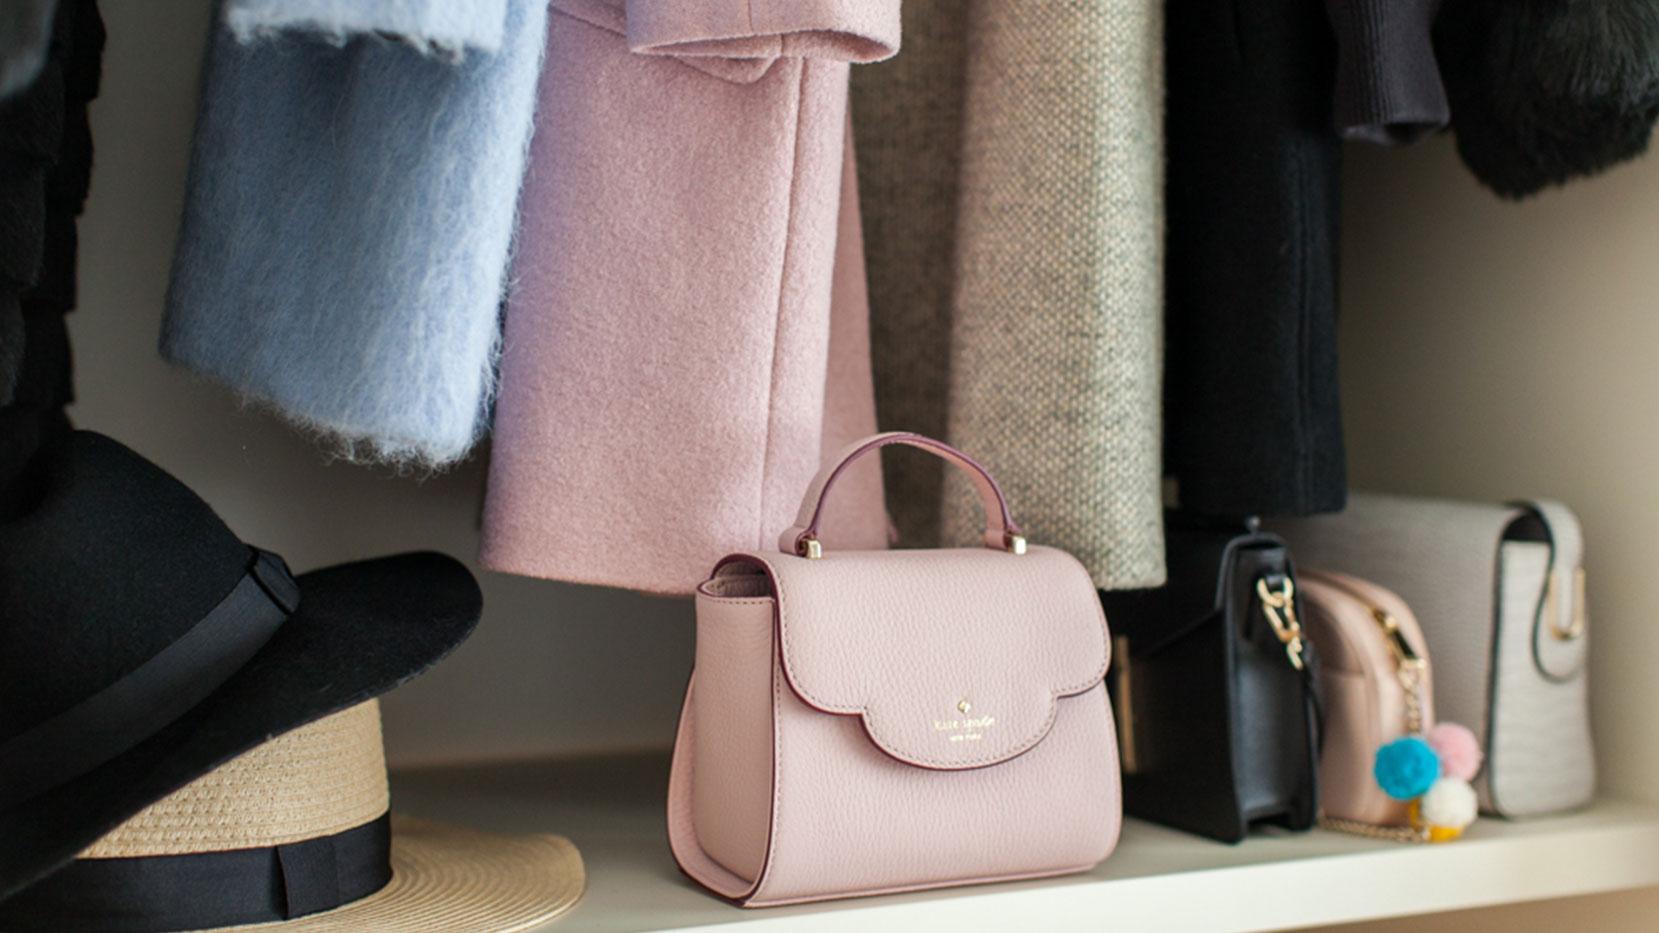 Elena Schiavon e la sua borsa